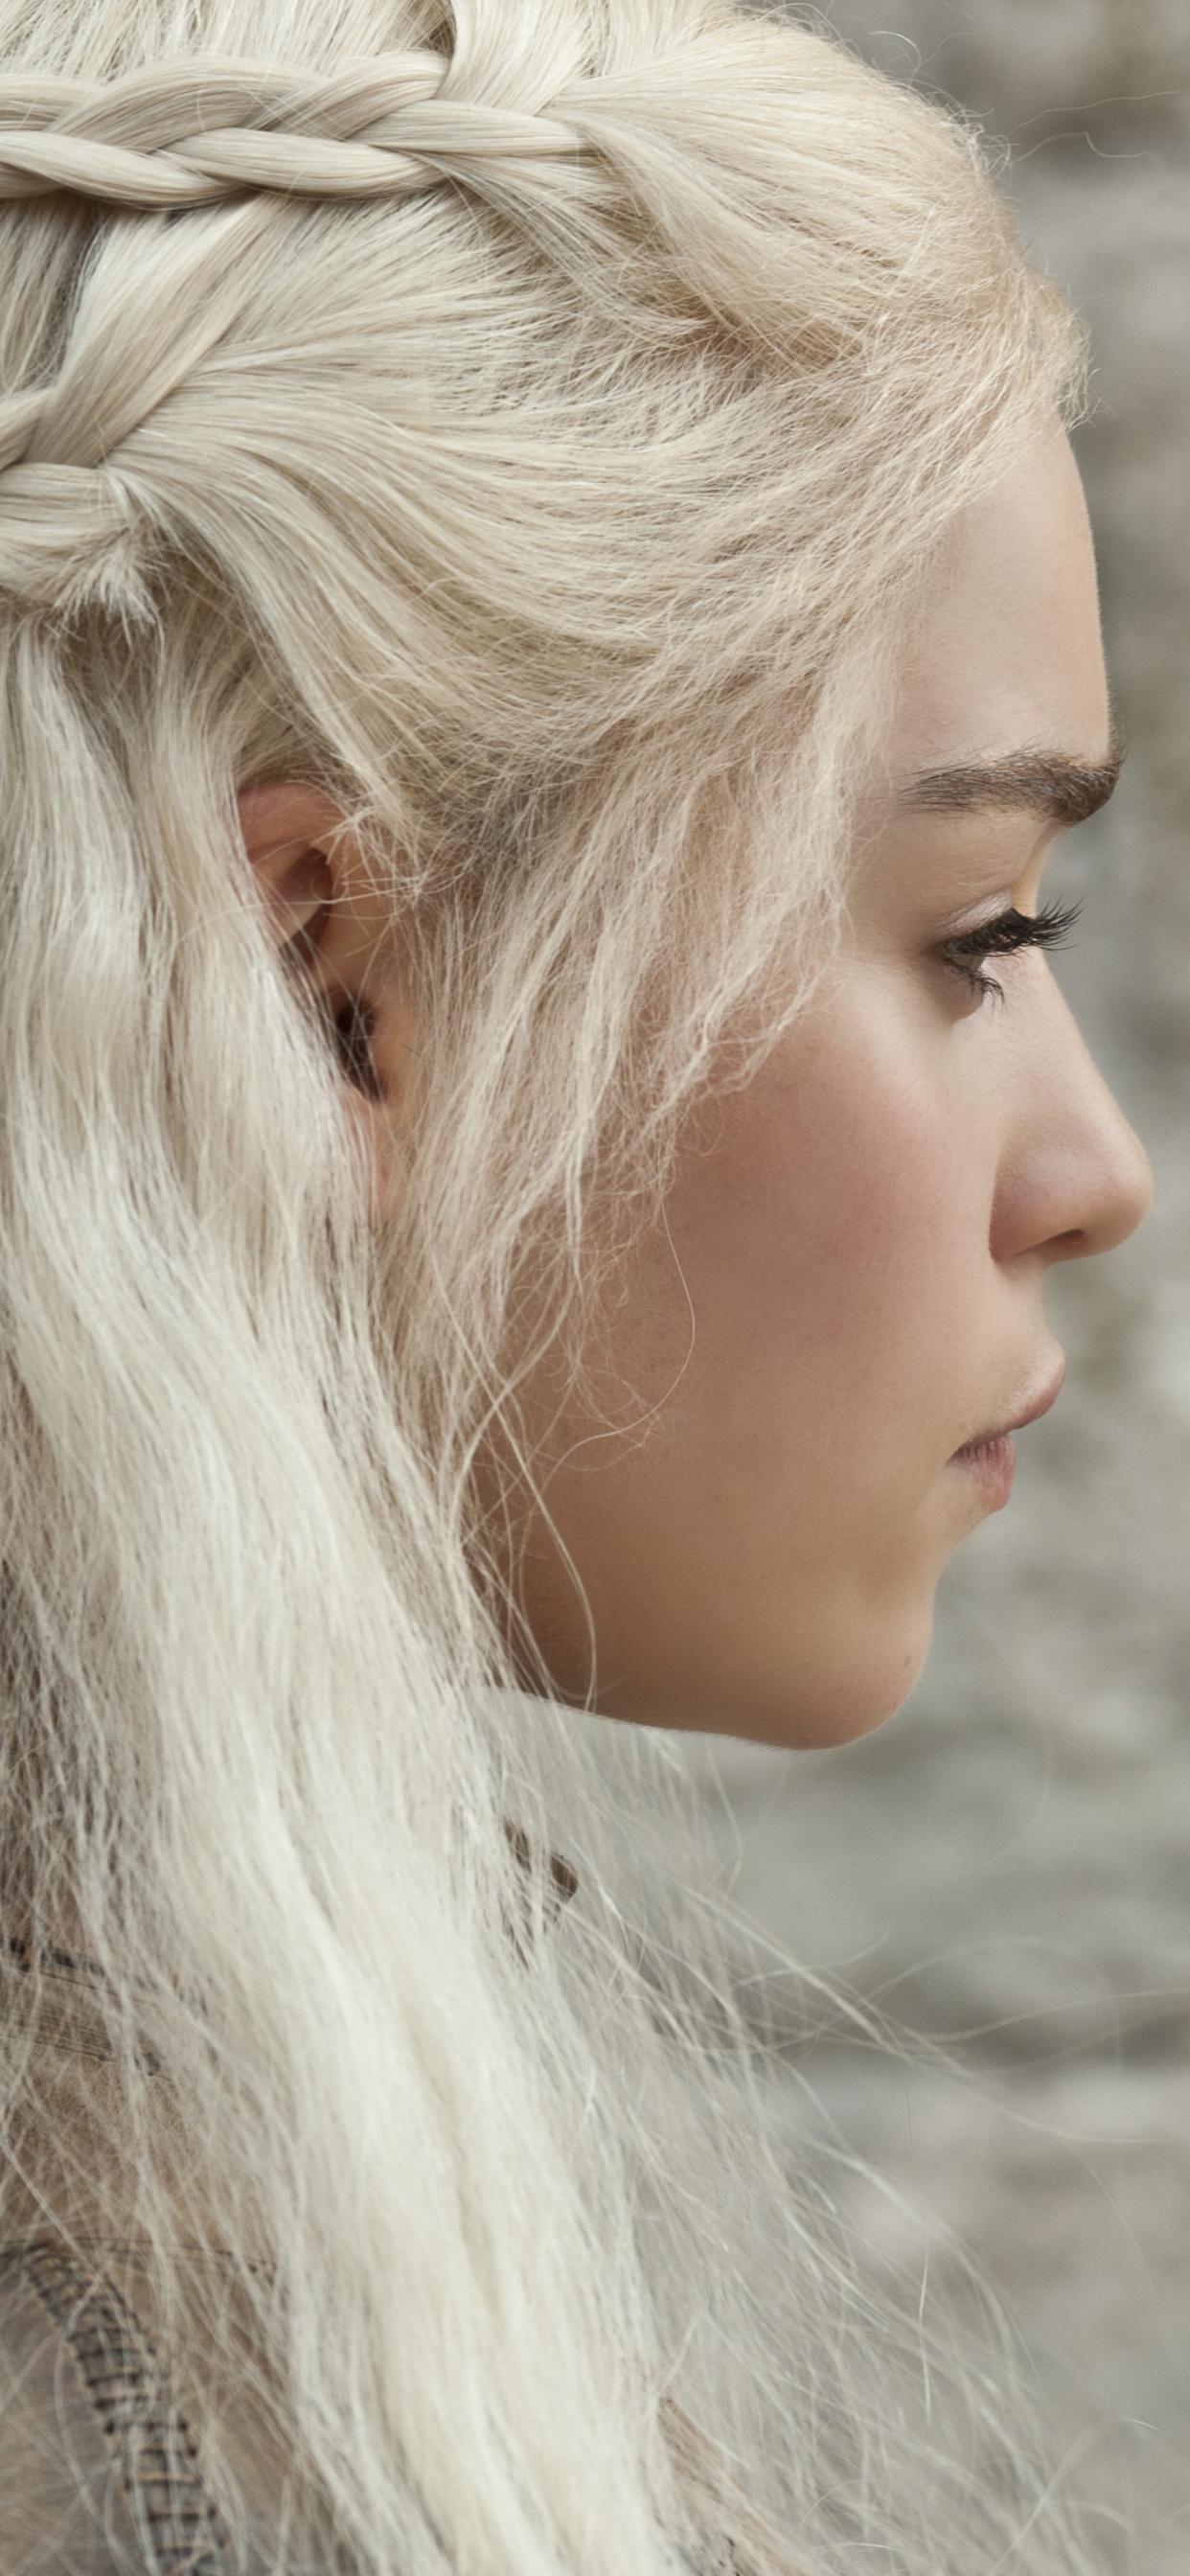 1242x2688 Game Of Thrones Daenerys Targaryen Iphone Xs Max